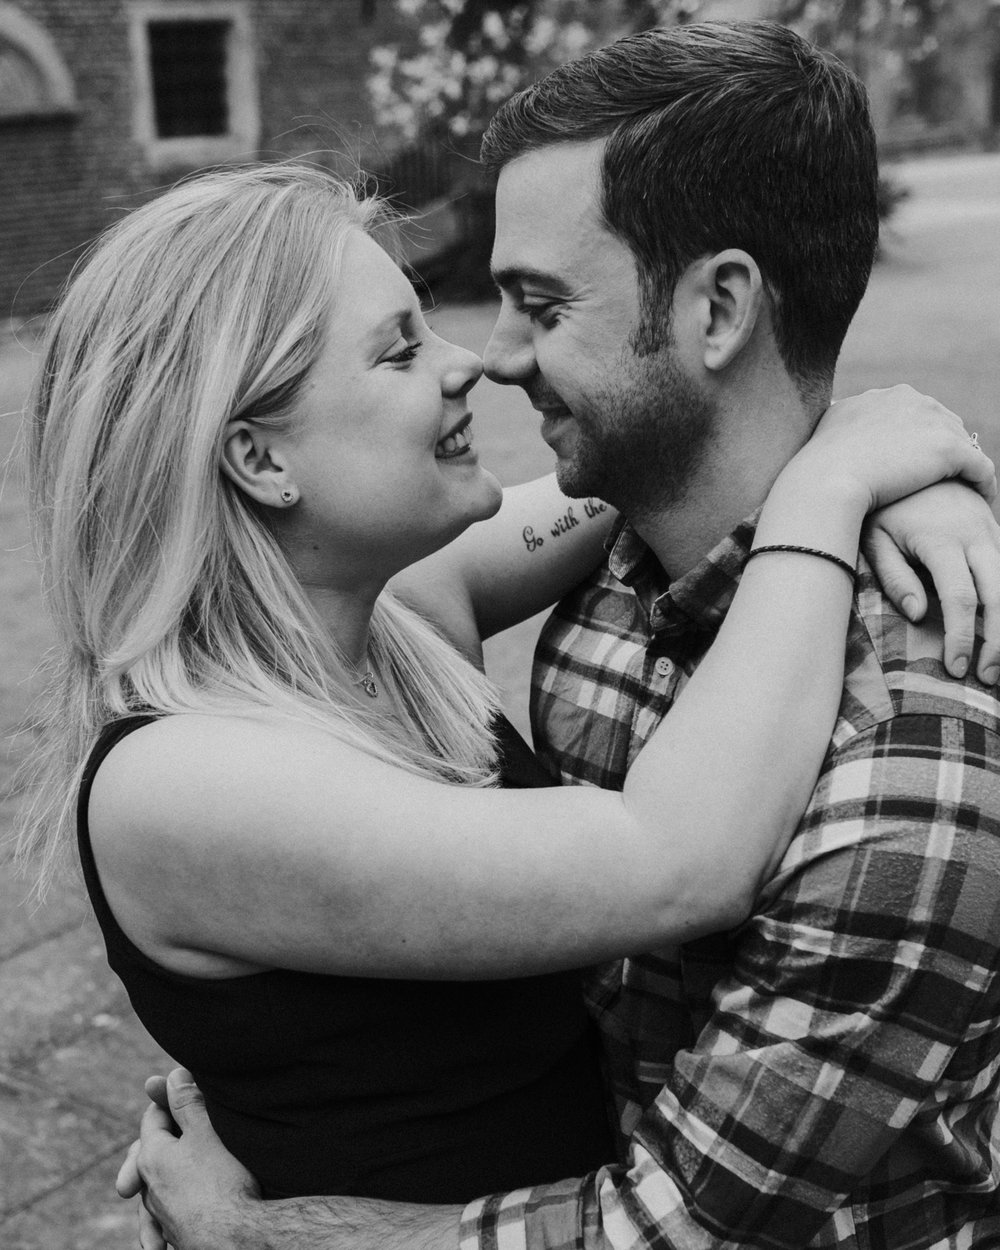 Engagement 2017 - 2018 (1 of 2)-2.jpg